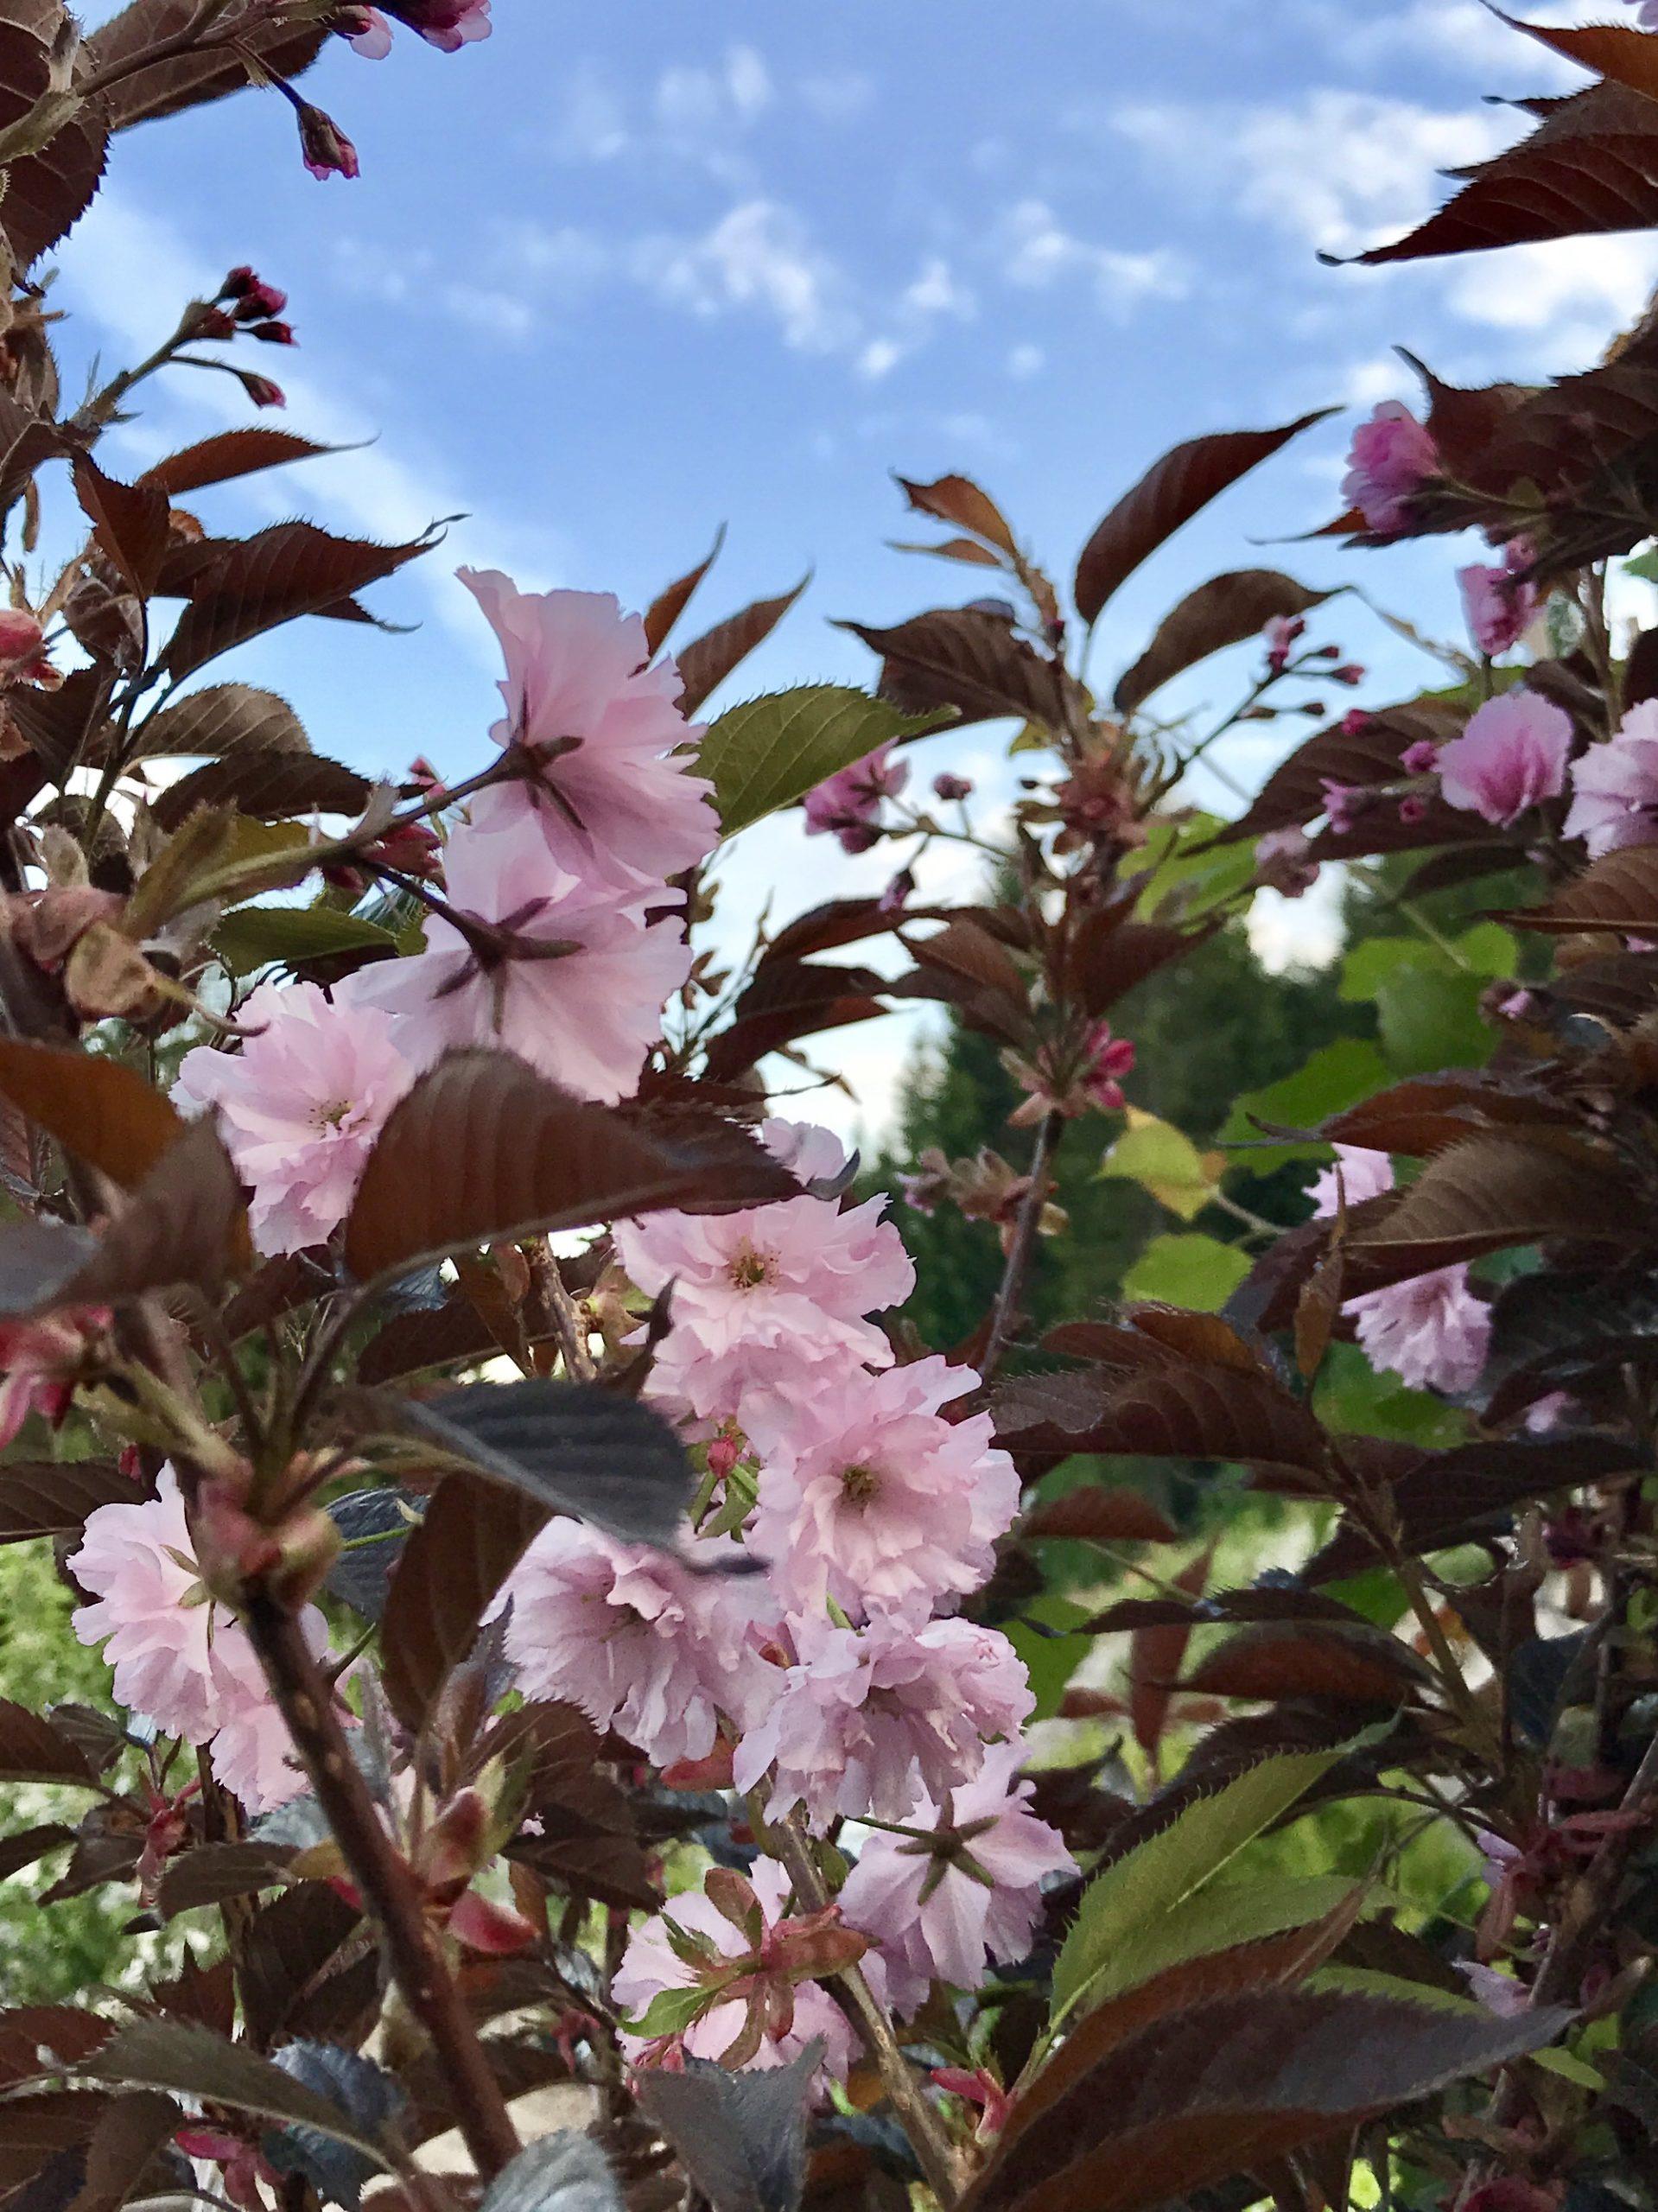 Prydkirsebær 'Royal Burgundy' Flerstammet